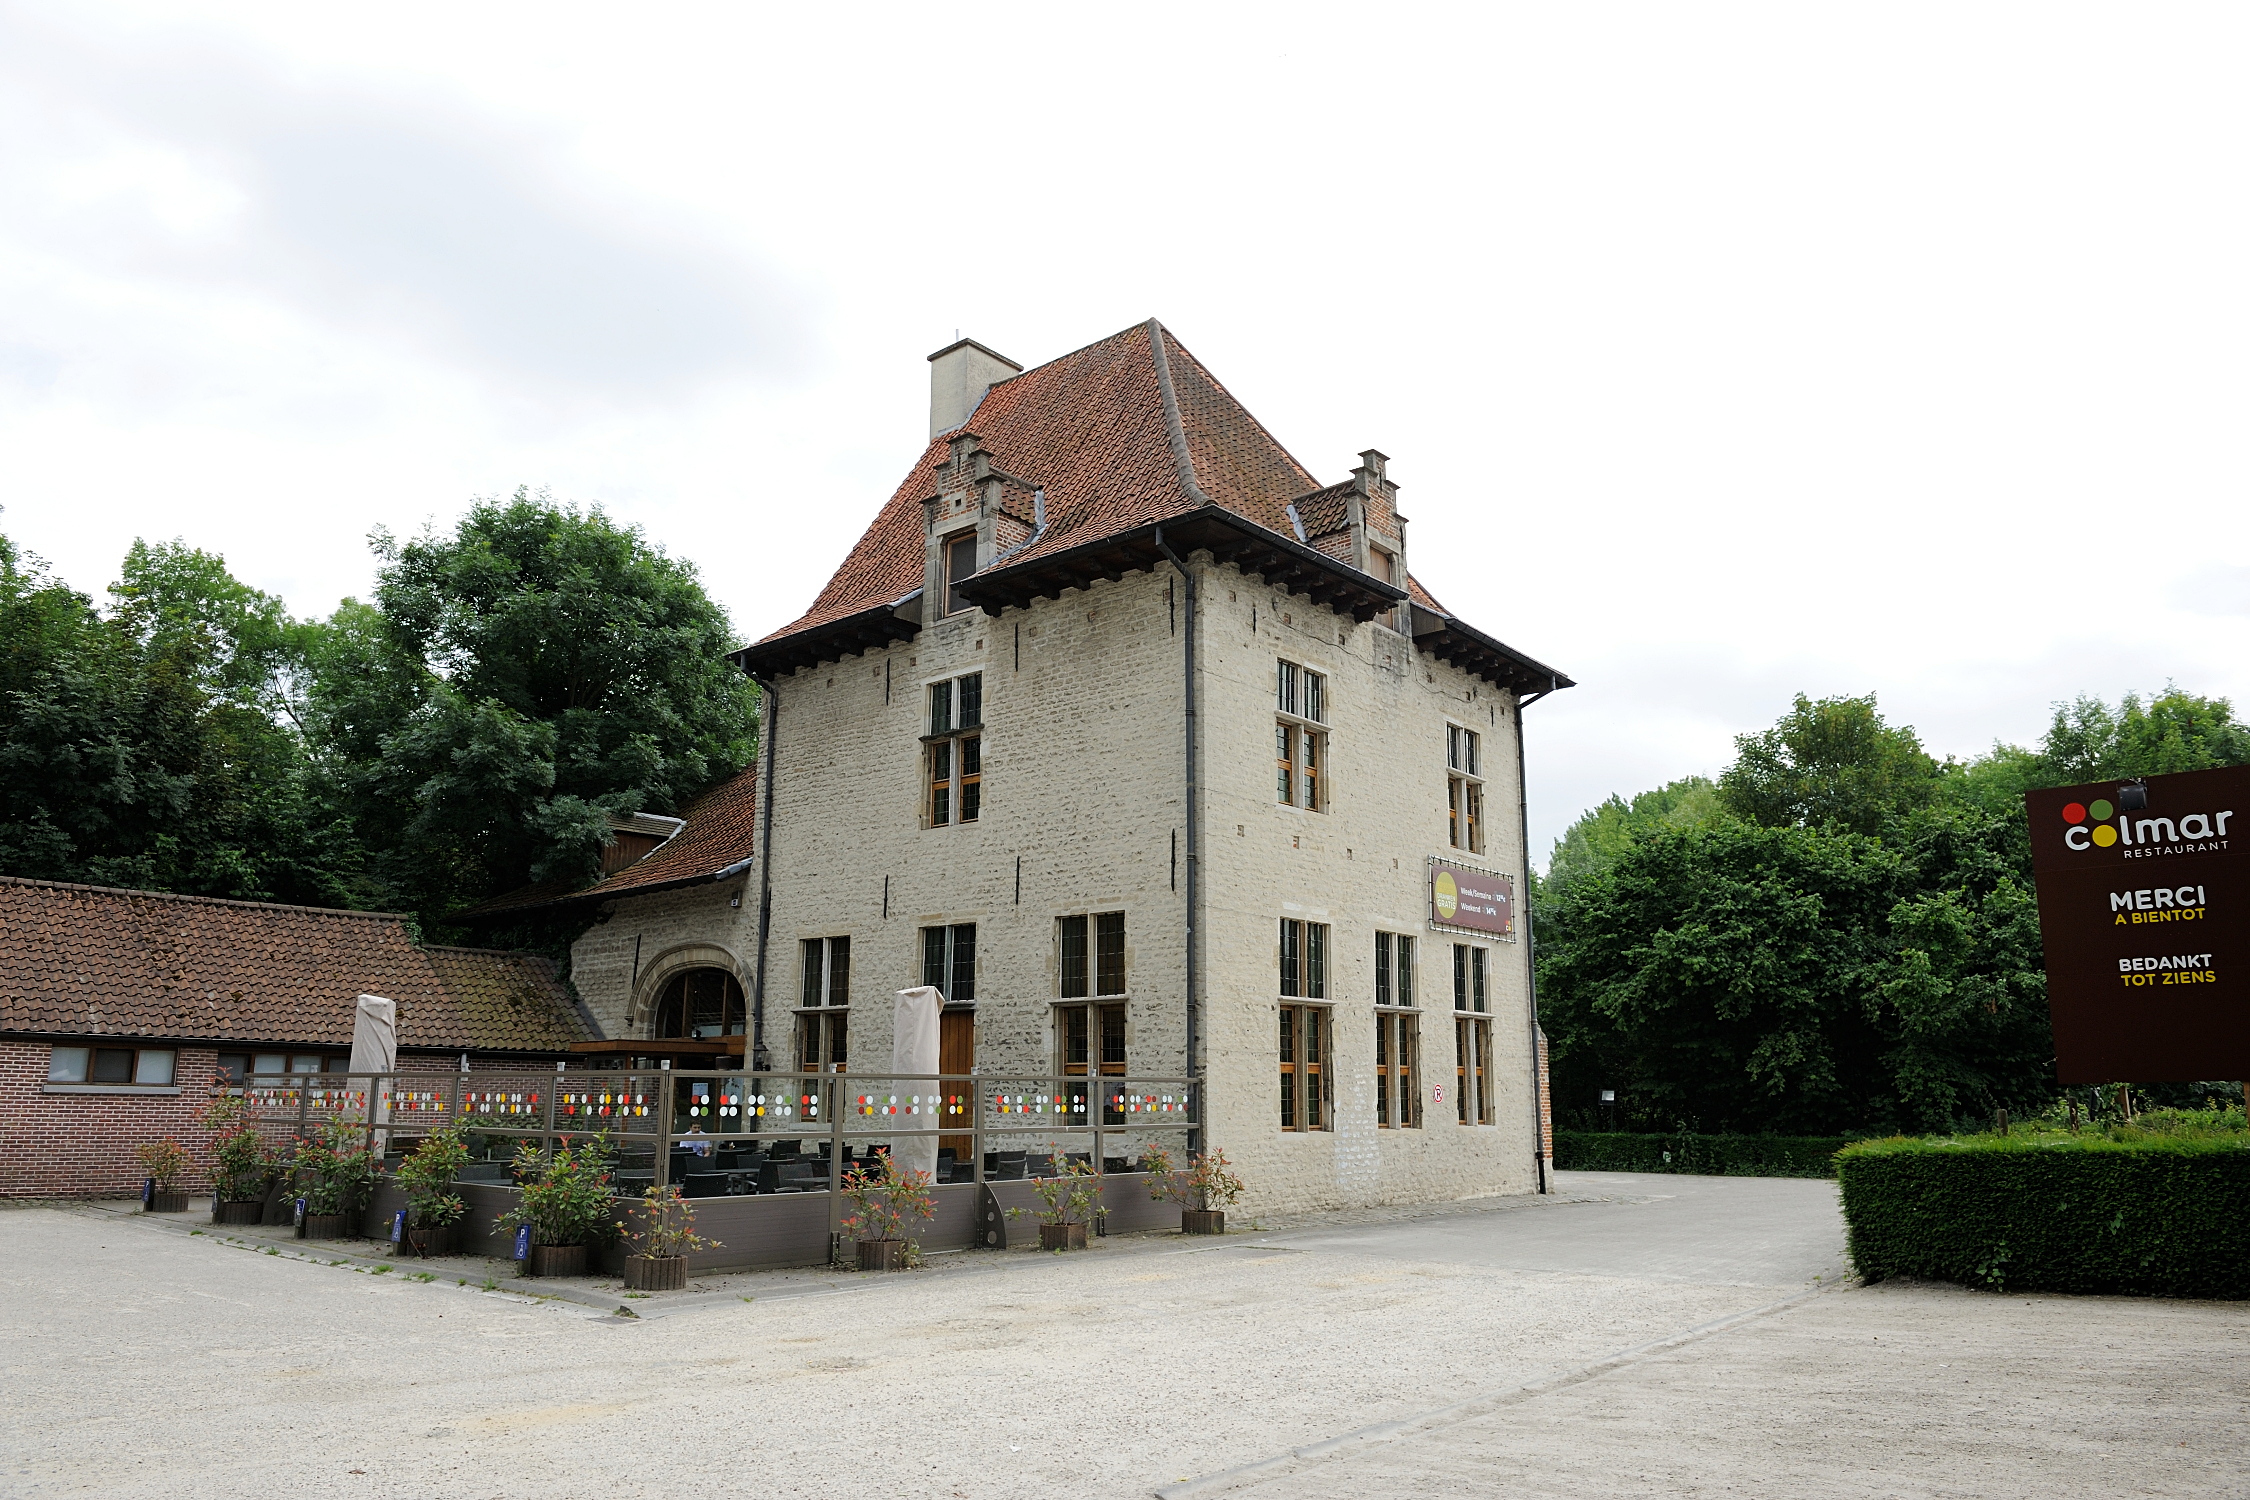 Colmar woluwe restaurant bruxelles woluwe saint for Adresse maison communale woluwe saint lambert